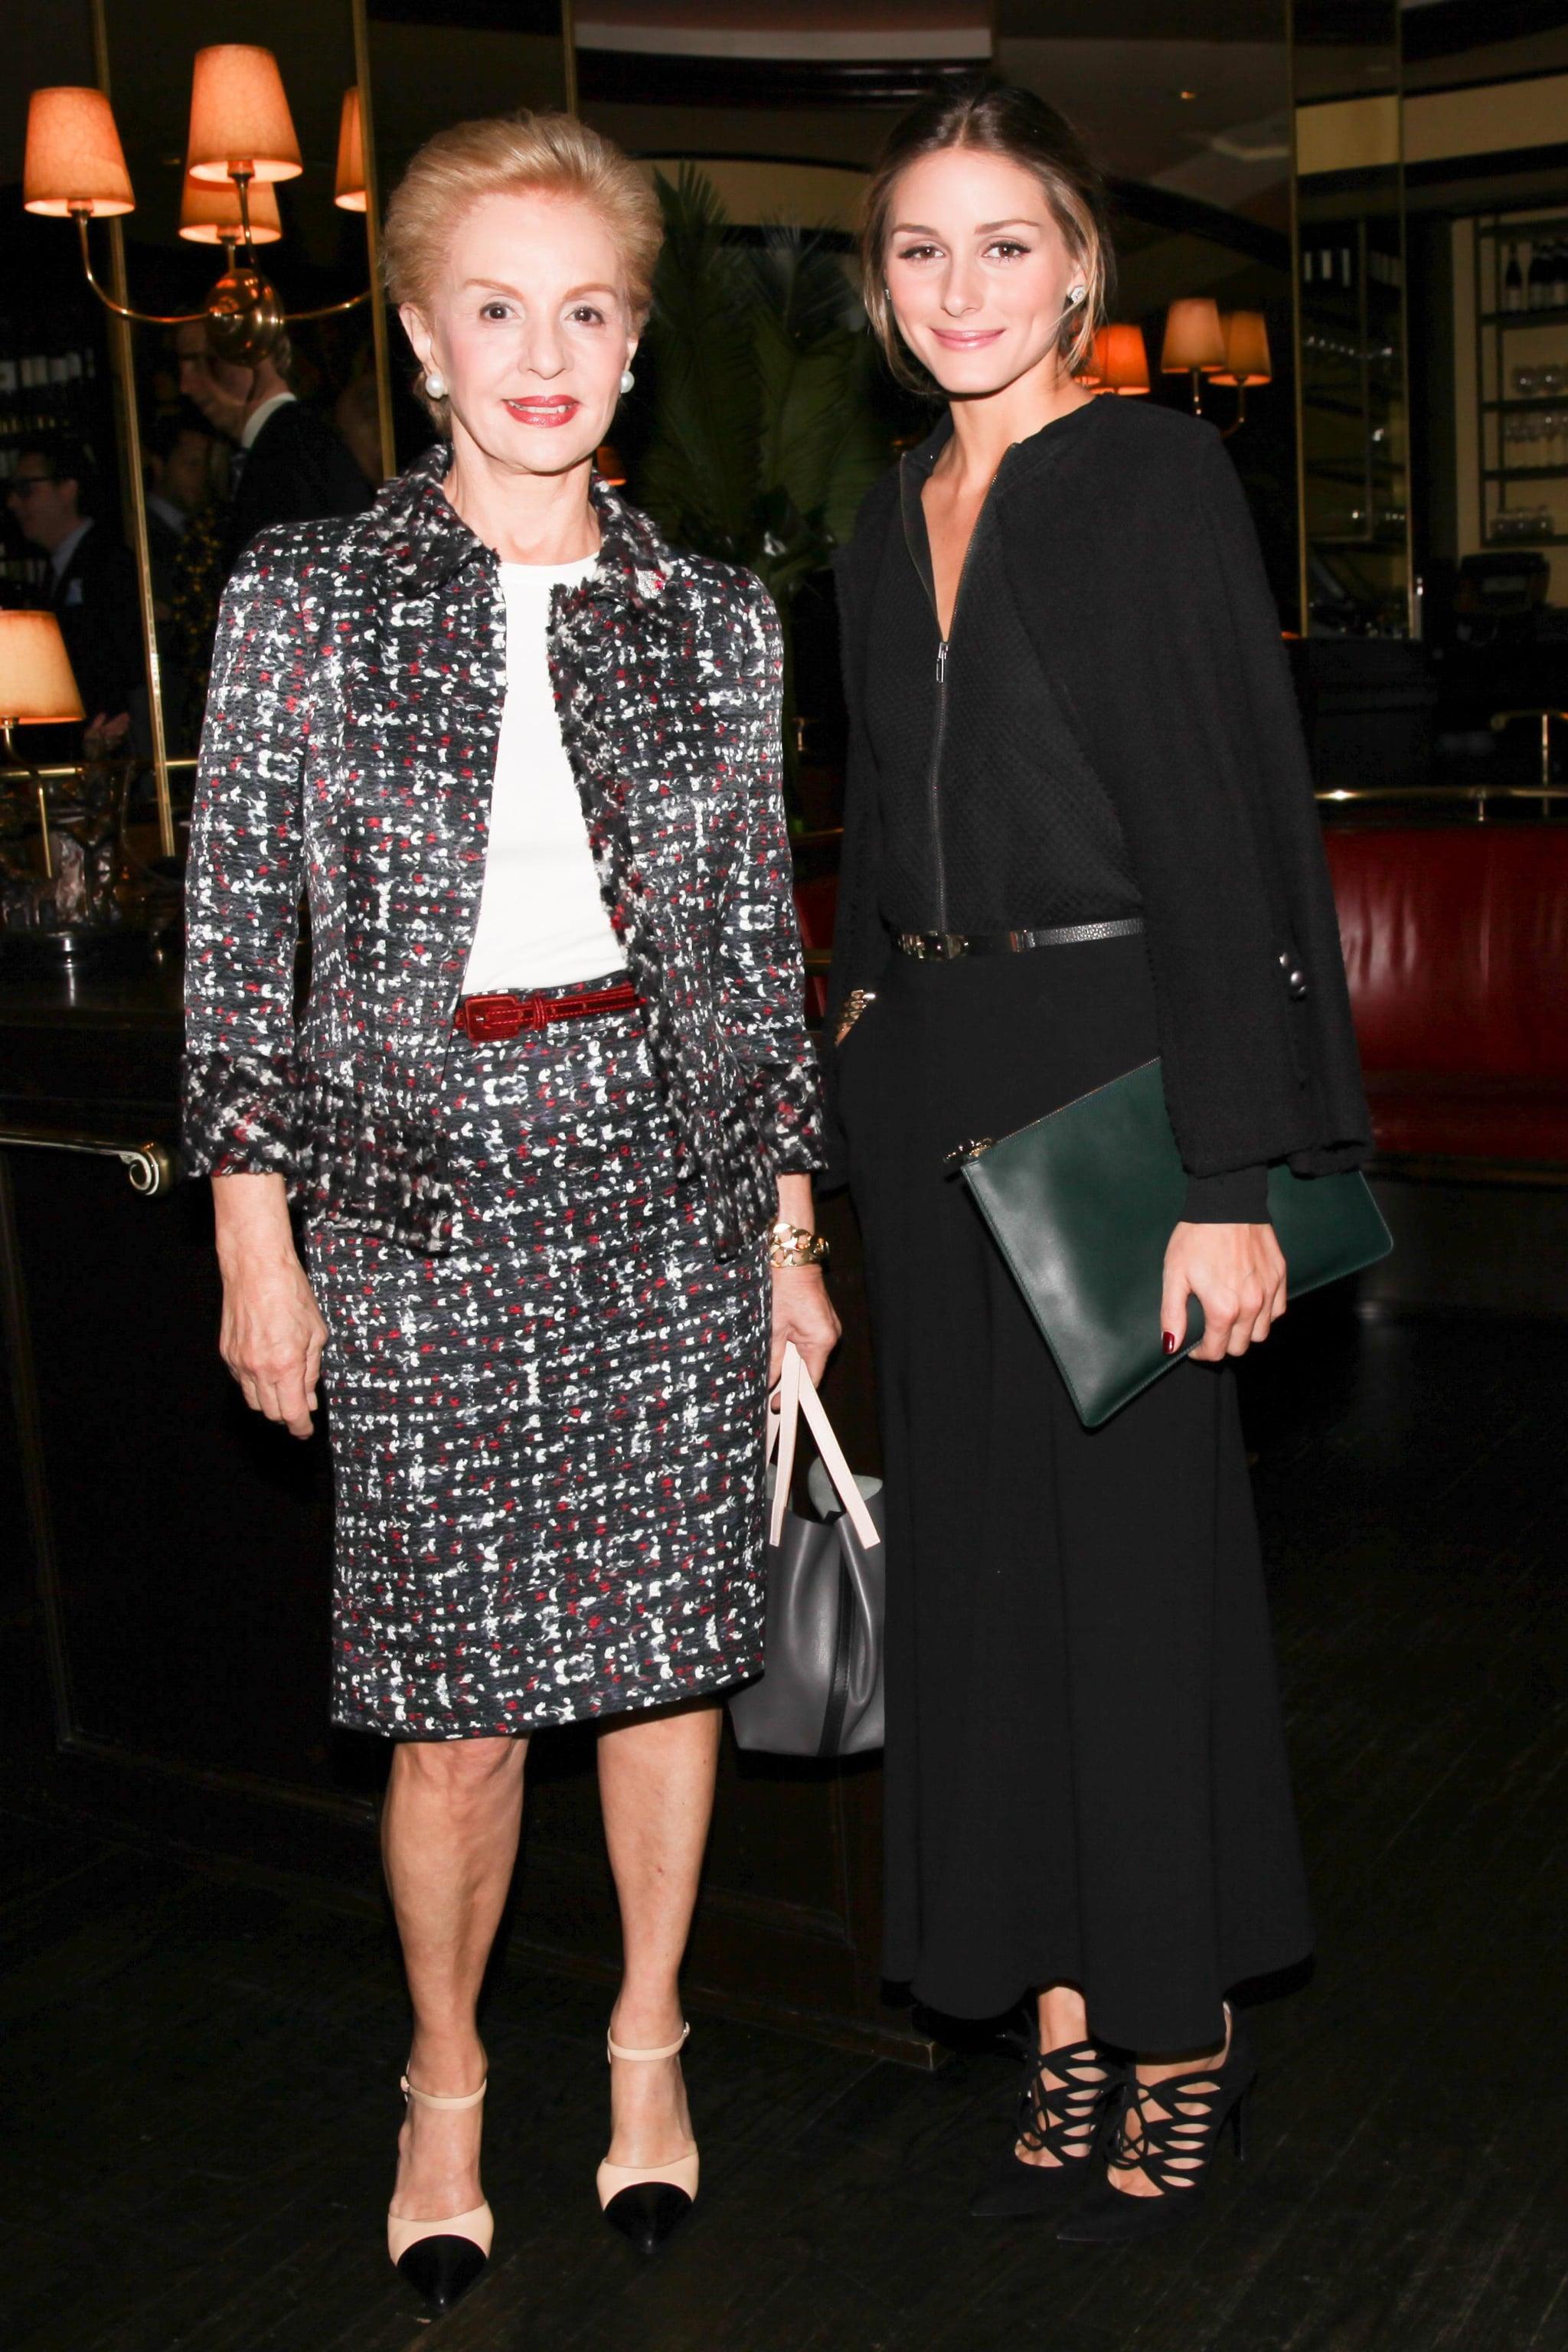 Carolina Herrera and Olivia Palermo made a chic duo at Vanity Fair's NYC dinner.